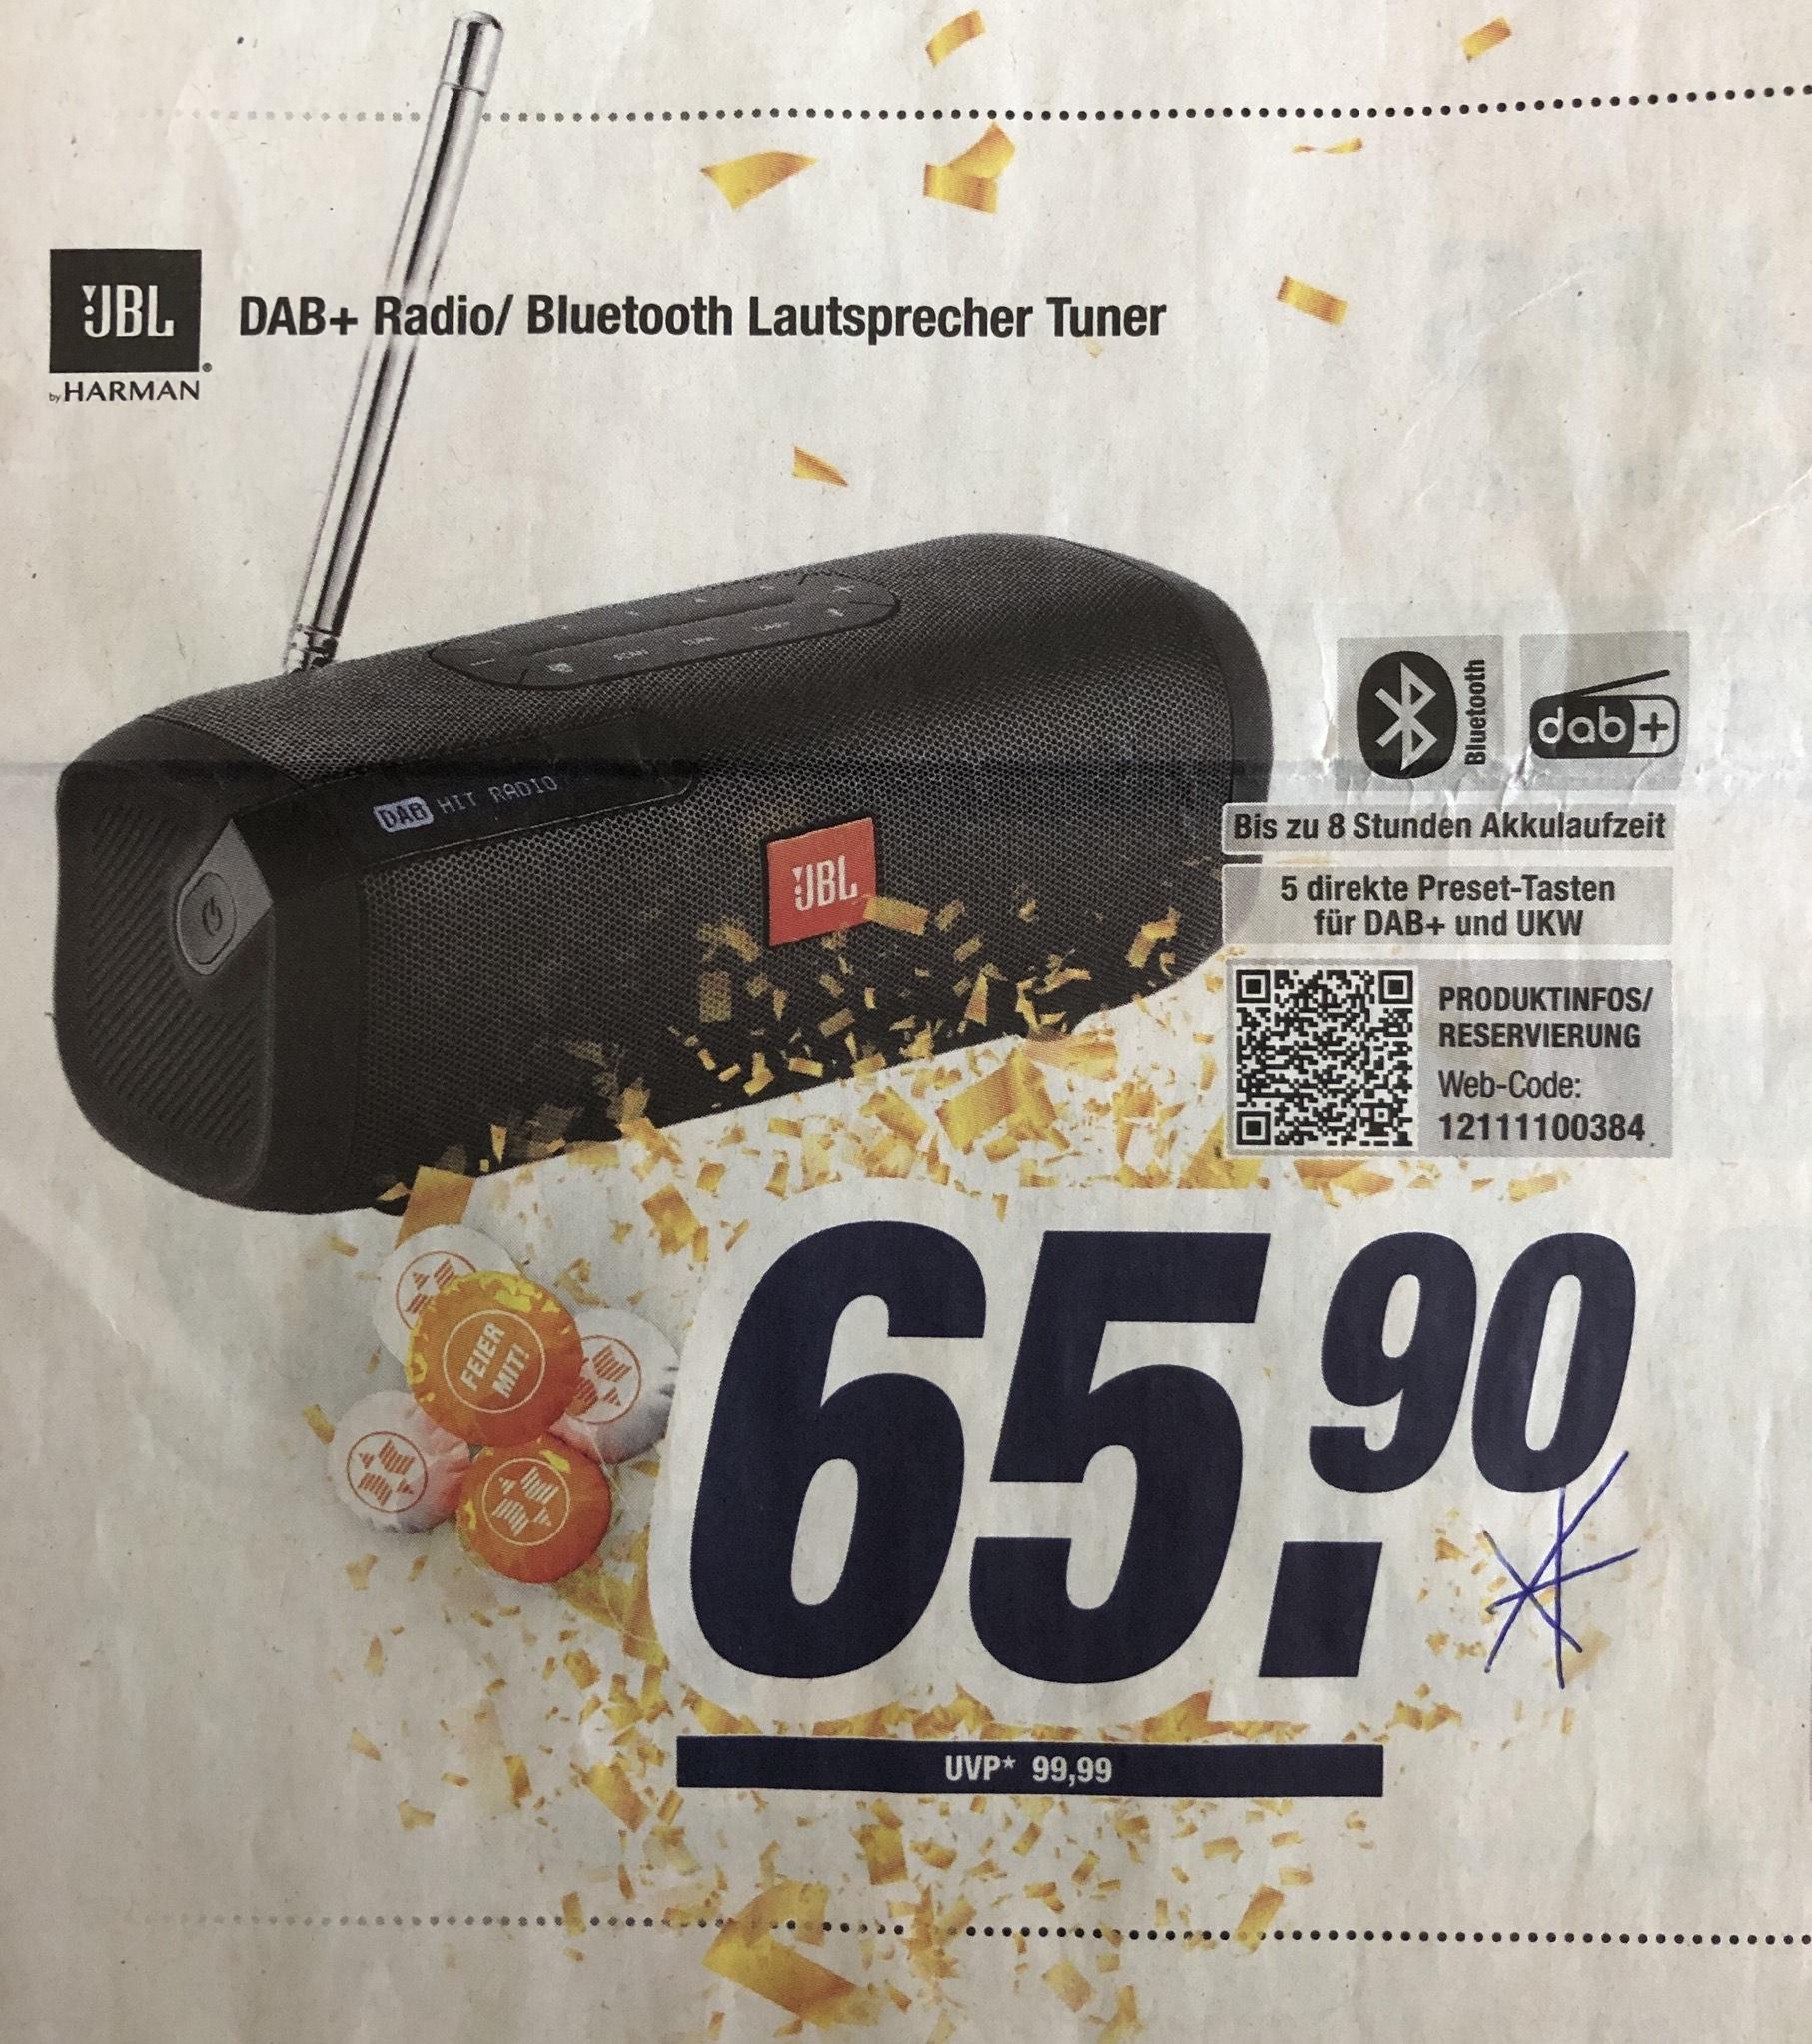 JBL DAB+ Tuner Radio Bluetooth Lautsprecher 65,90€ expert online